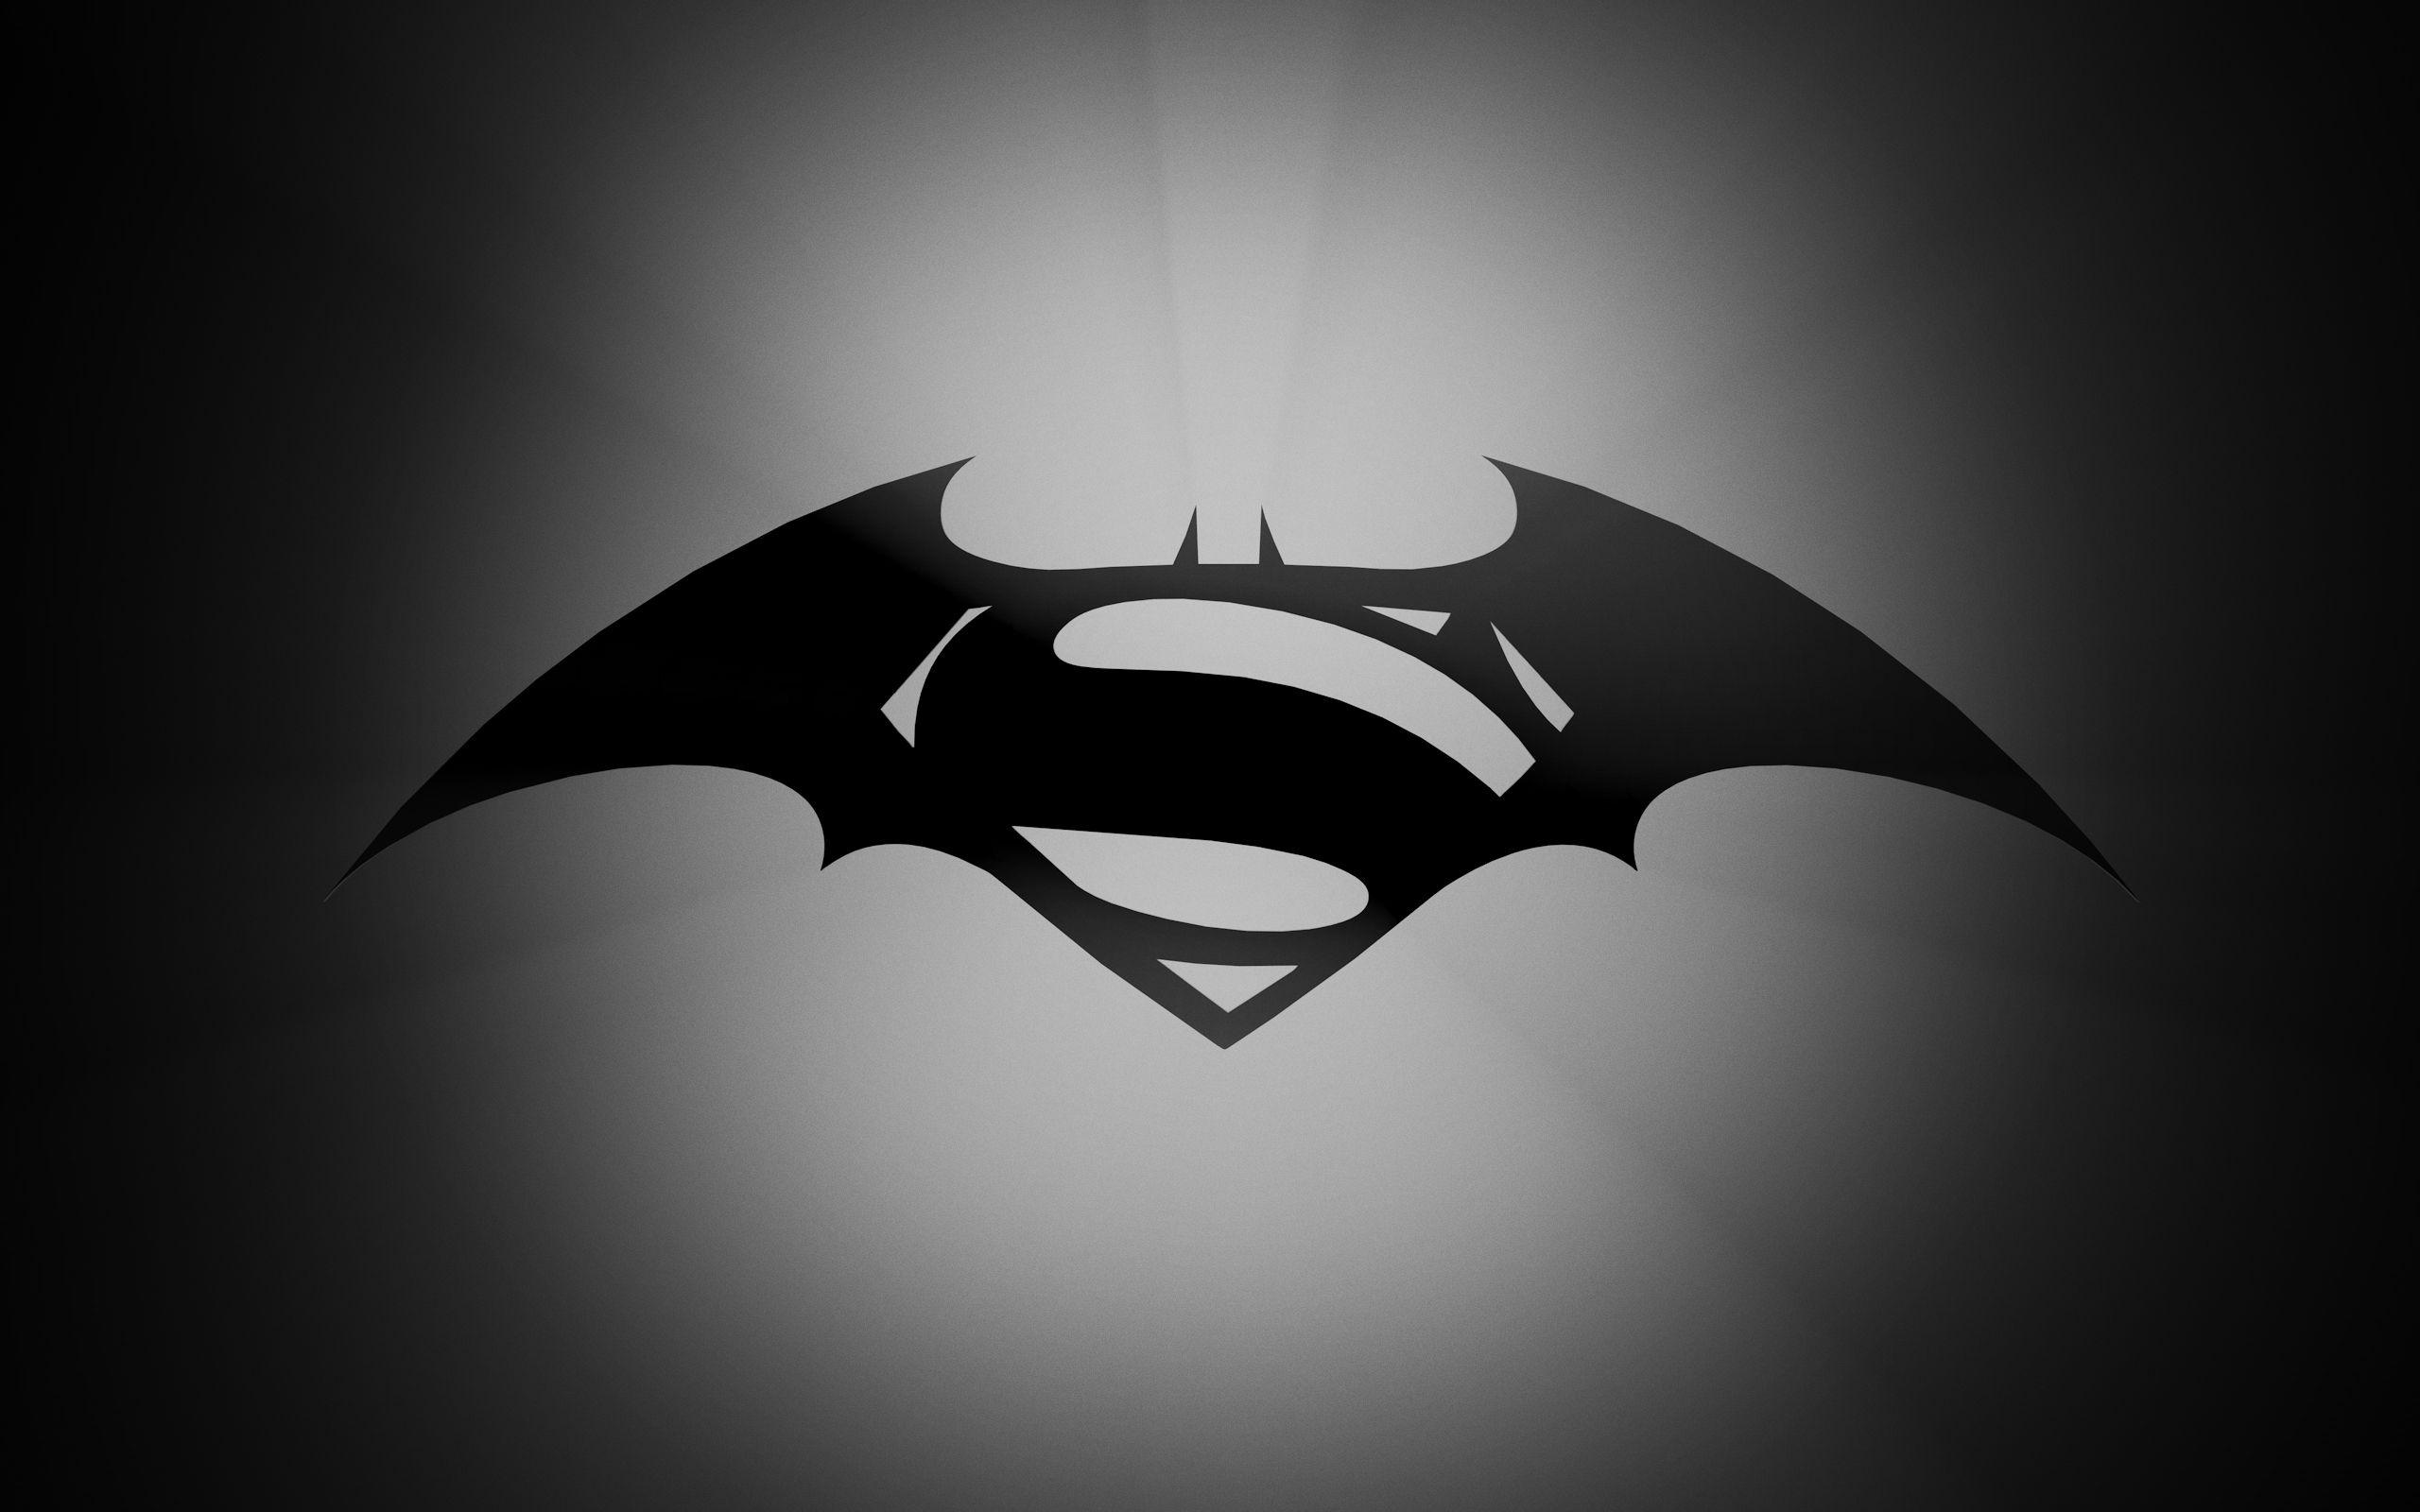 Batman vs super man movie logo images superman logo wallpaper batman biocorpaavc Choice Image